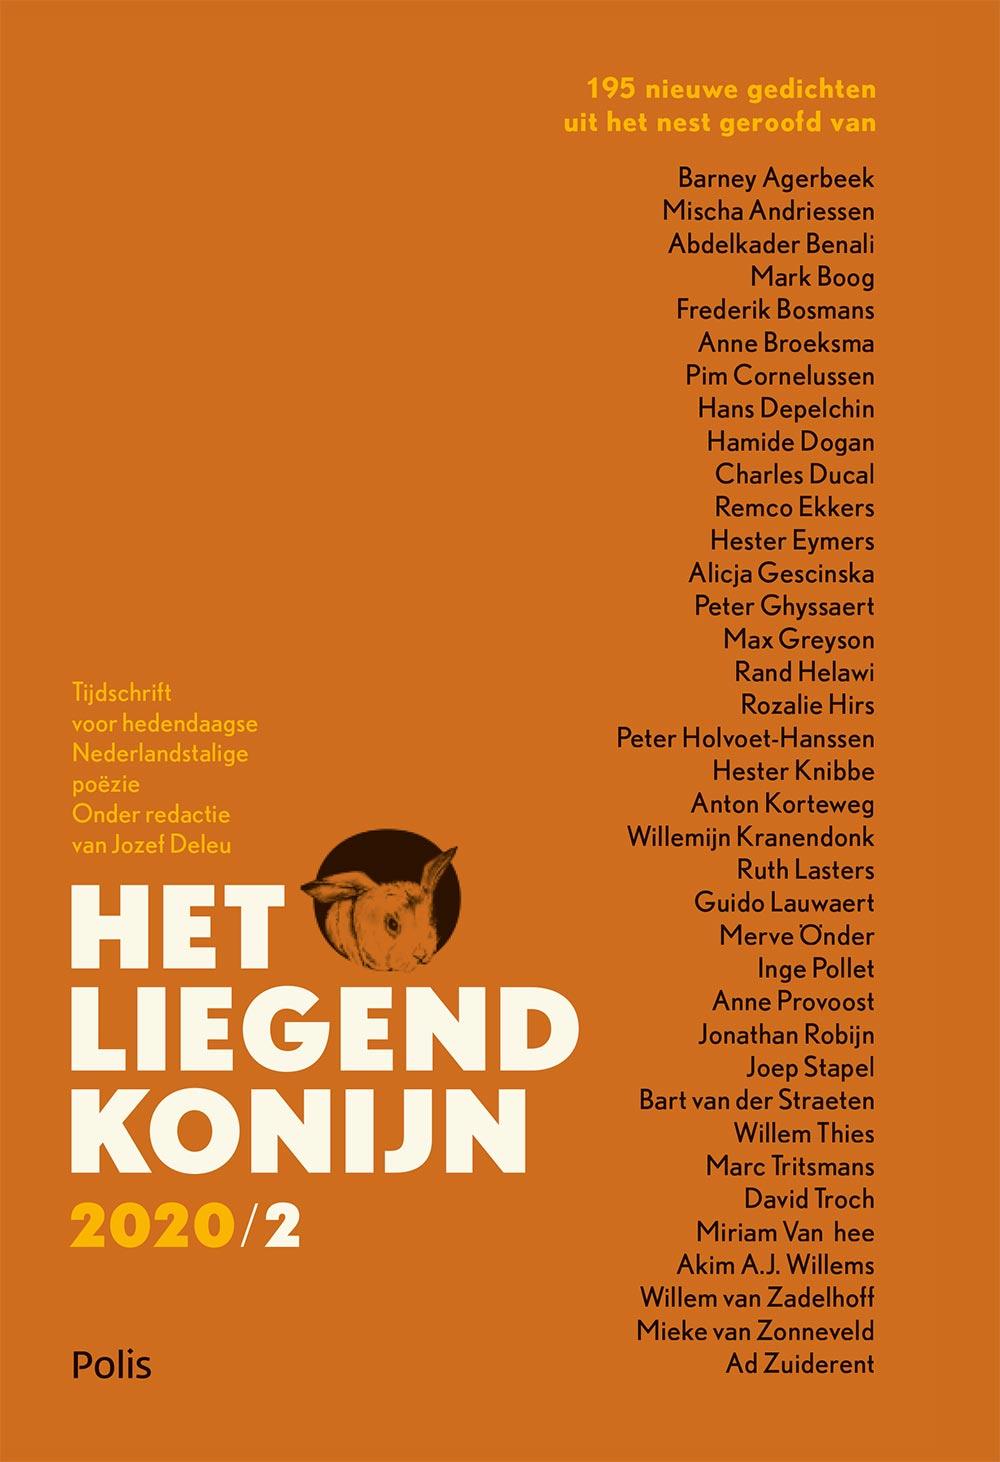 liegend konijn 2020/2 – publicatie